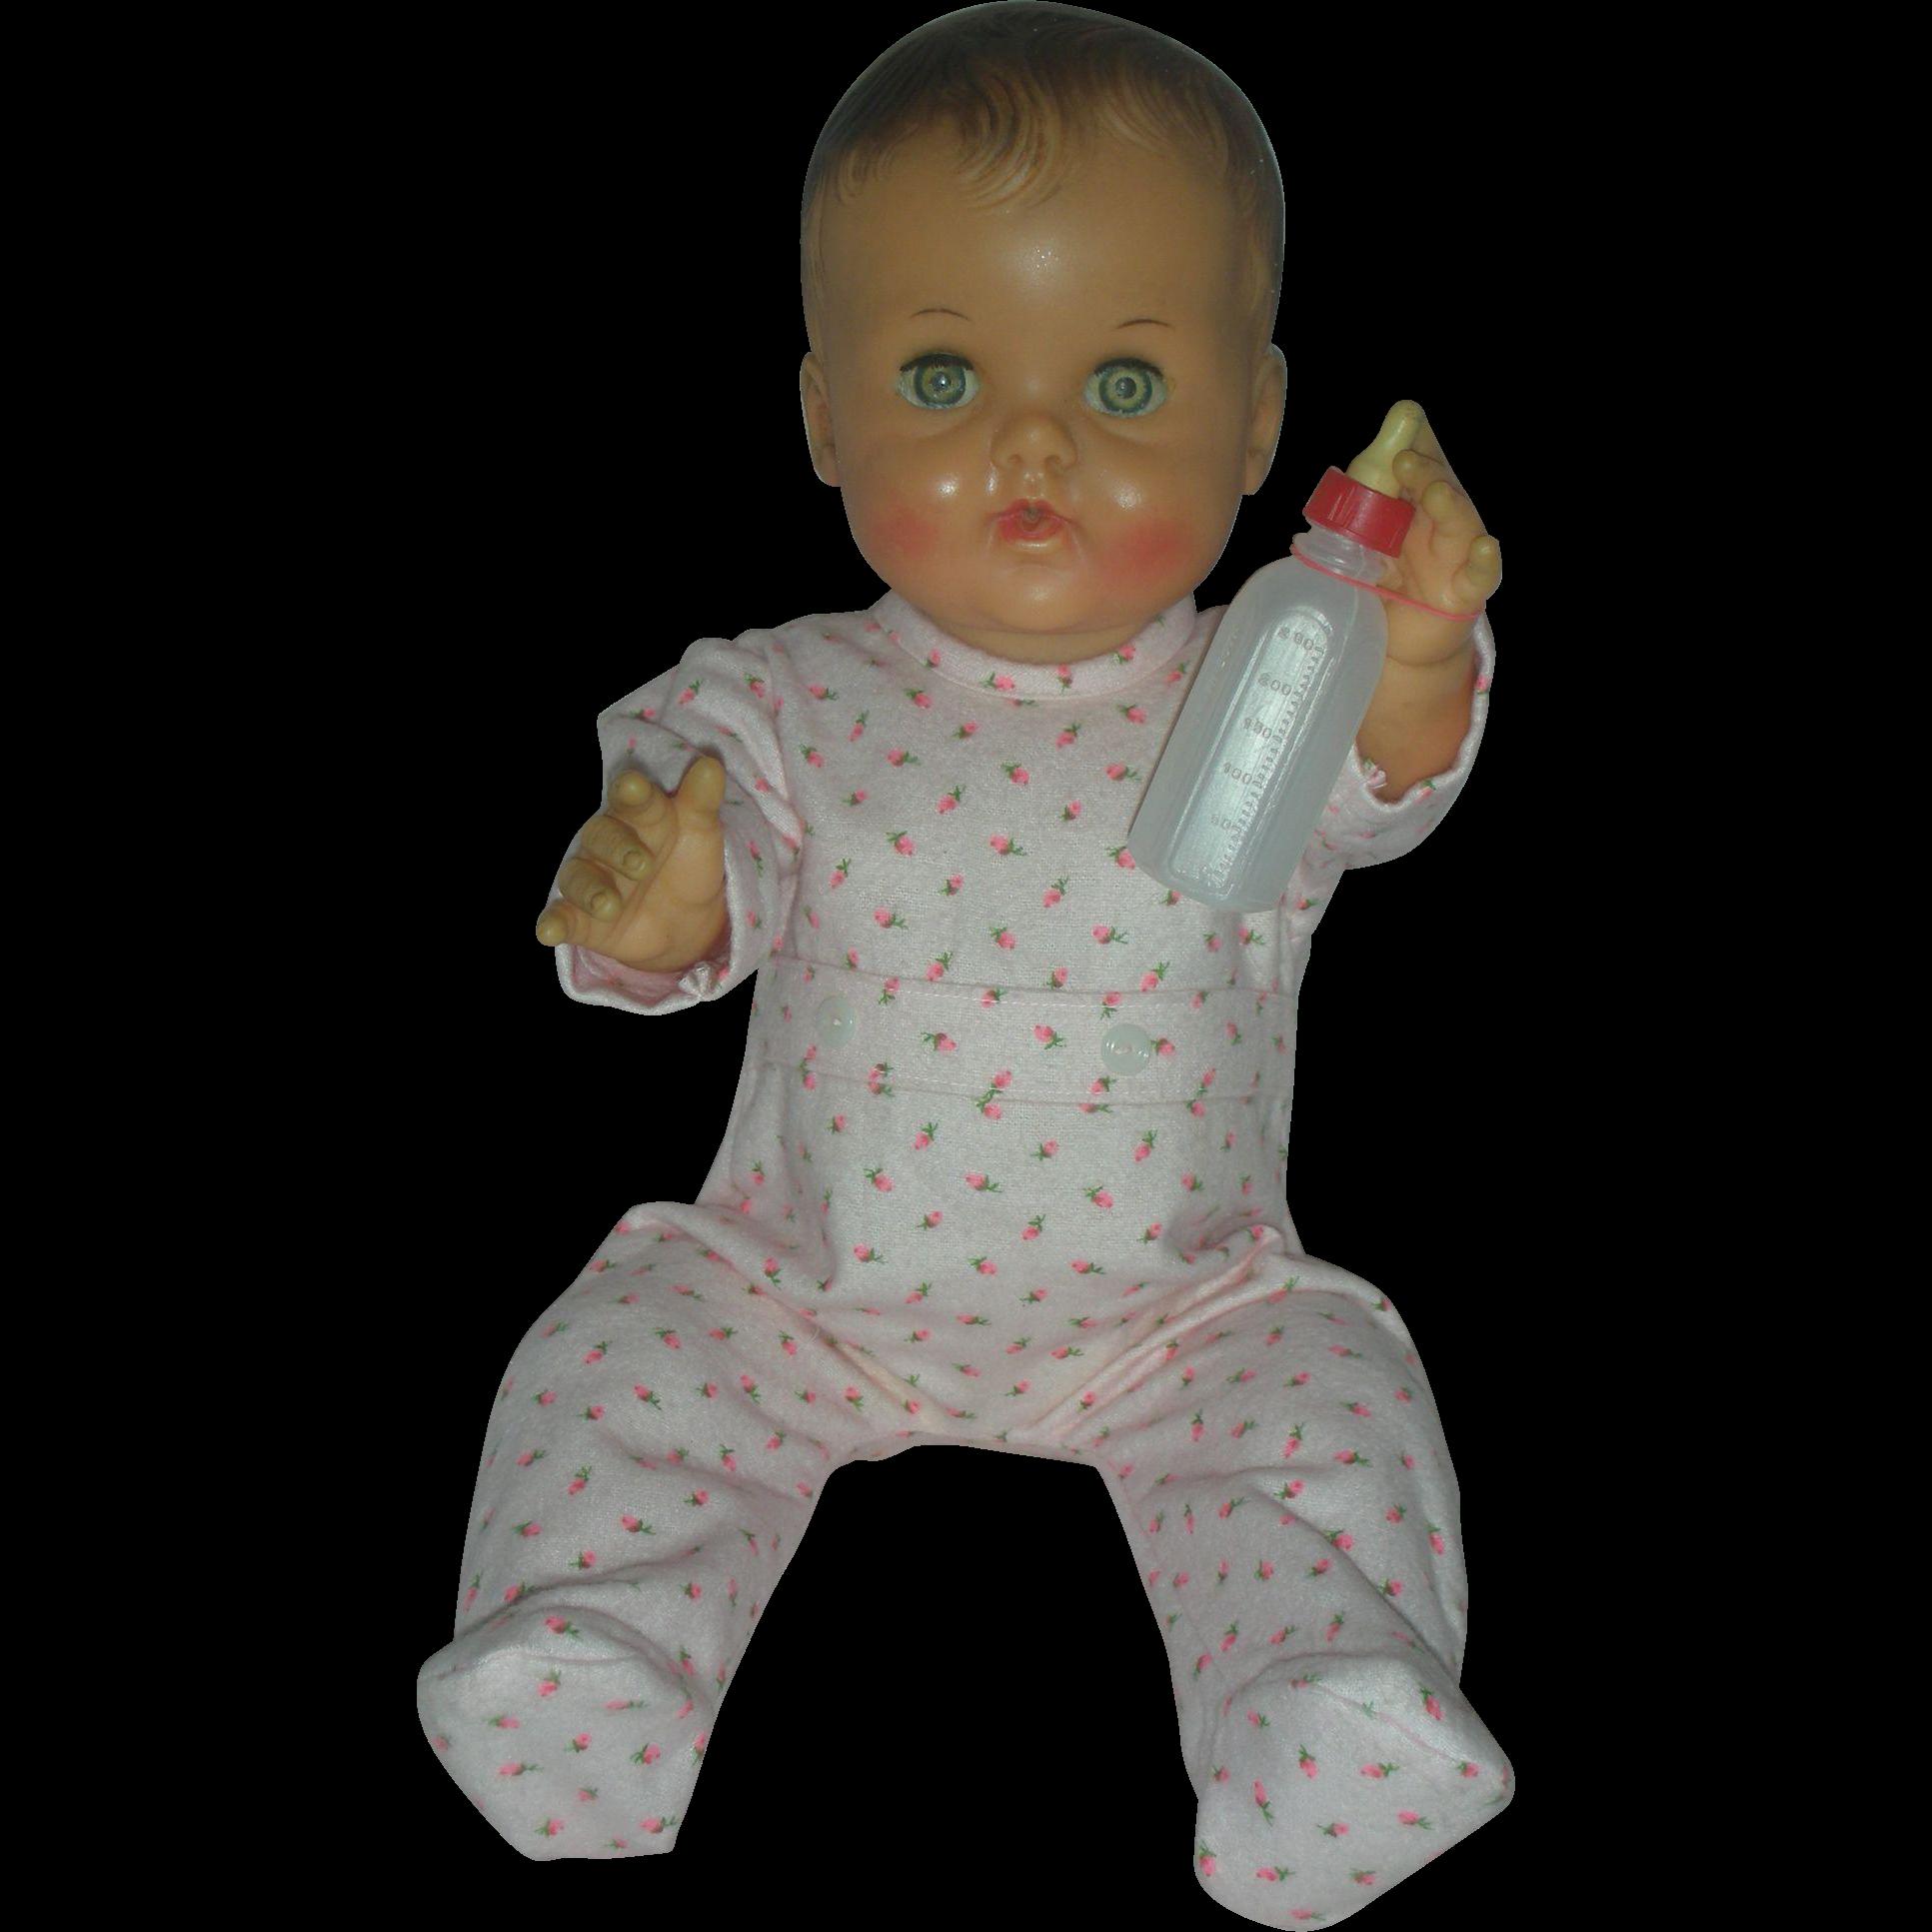 Rare Vintage Constance Bannister Drink And Wet Vinyl Baby Doll Vinyl Baby Dolls Vintage